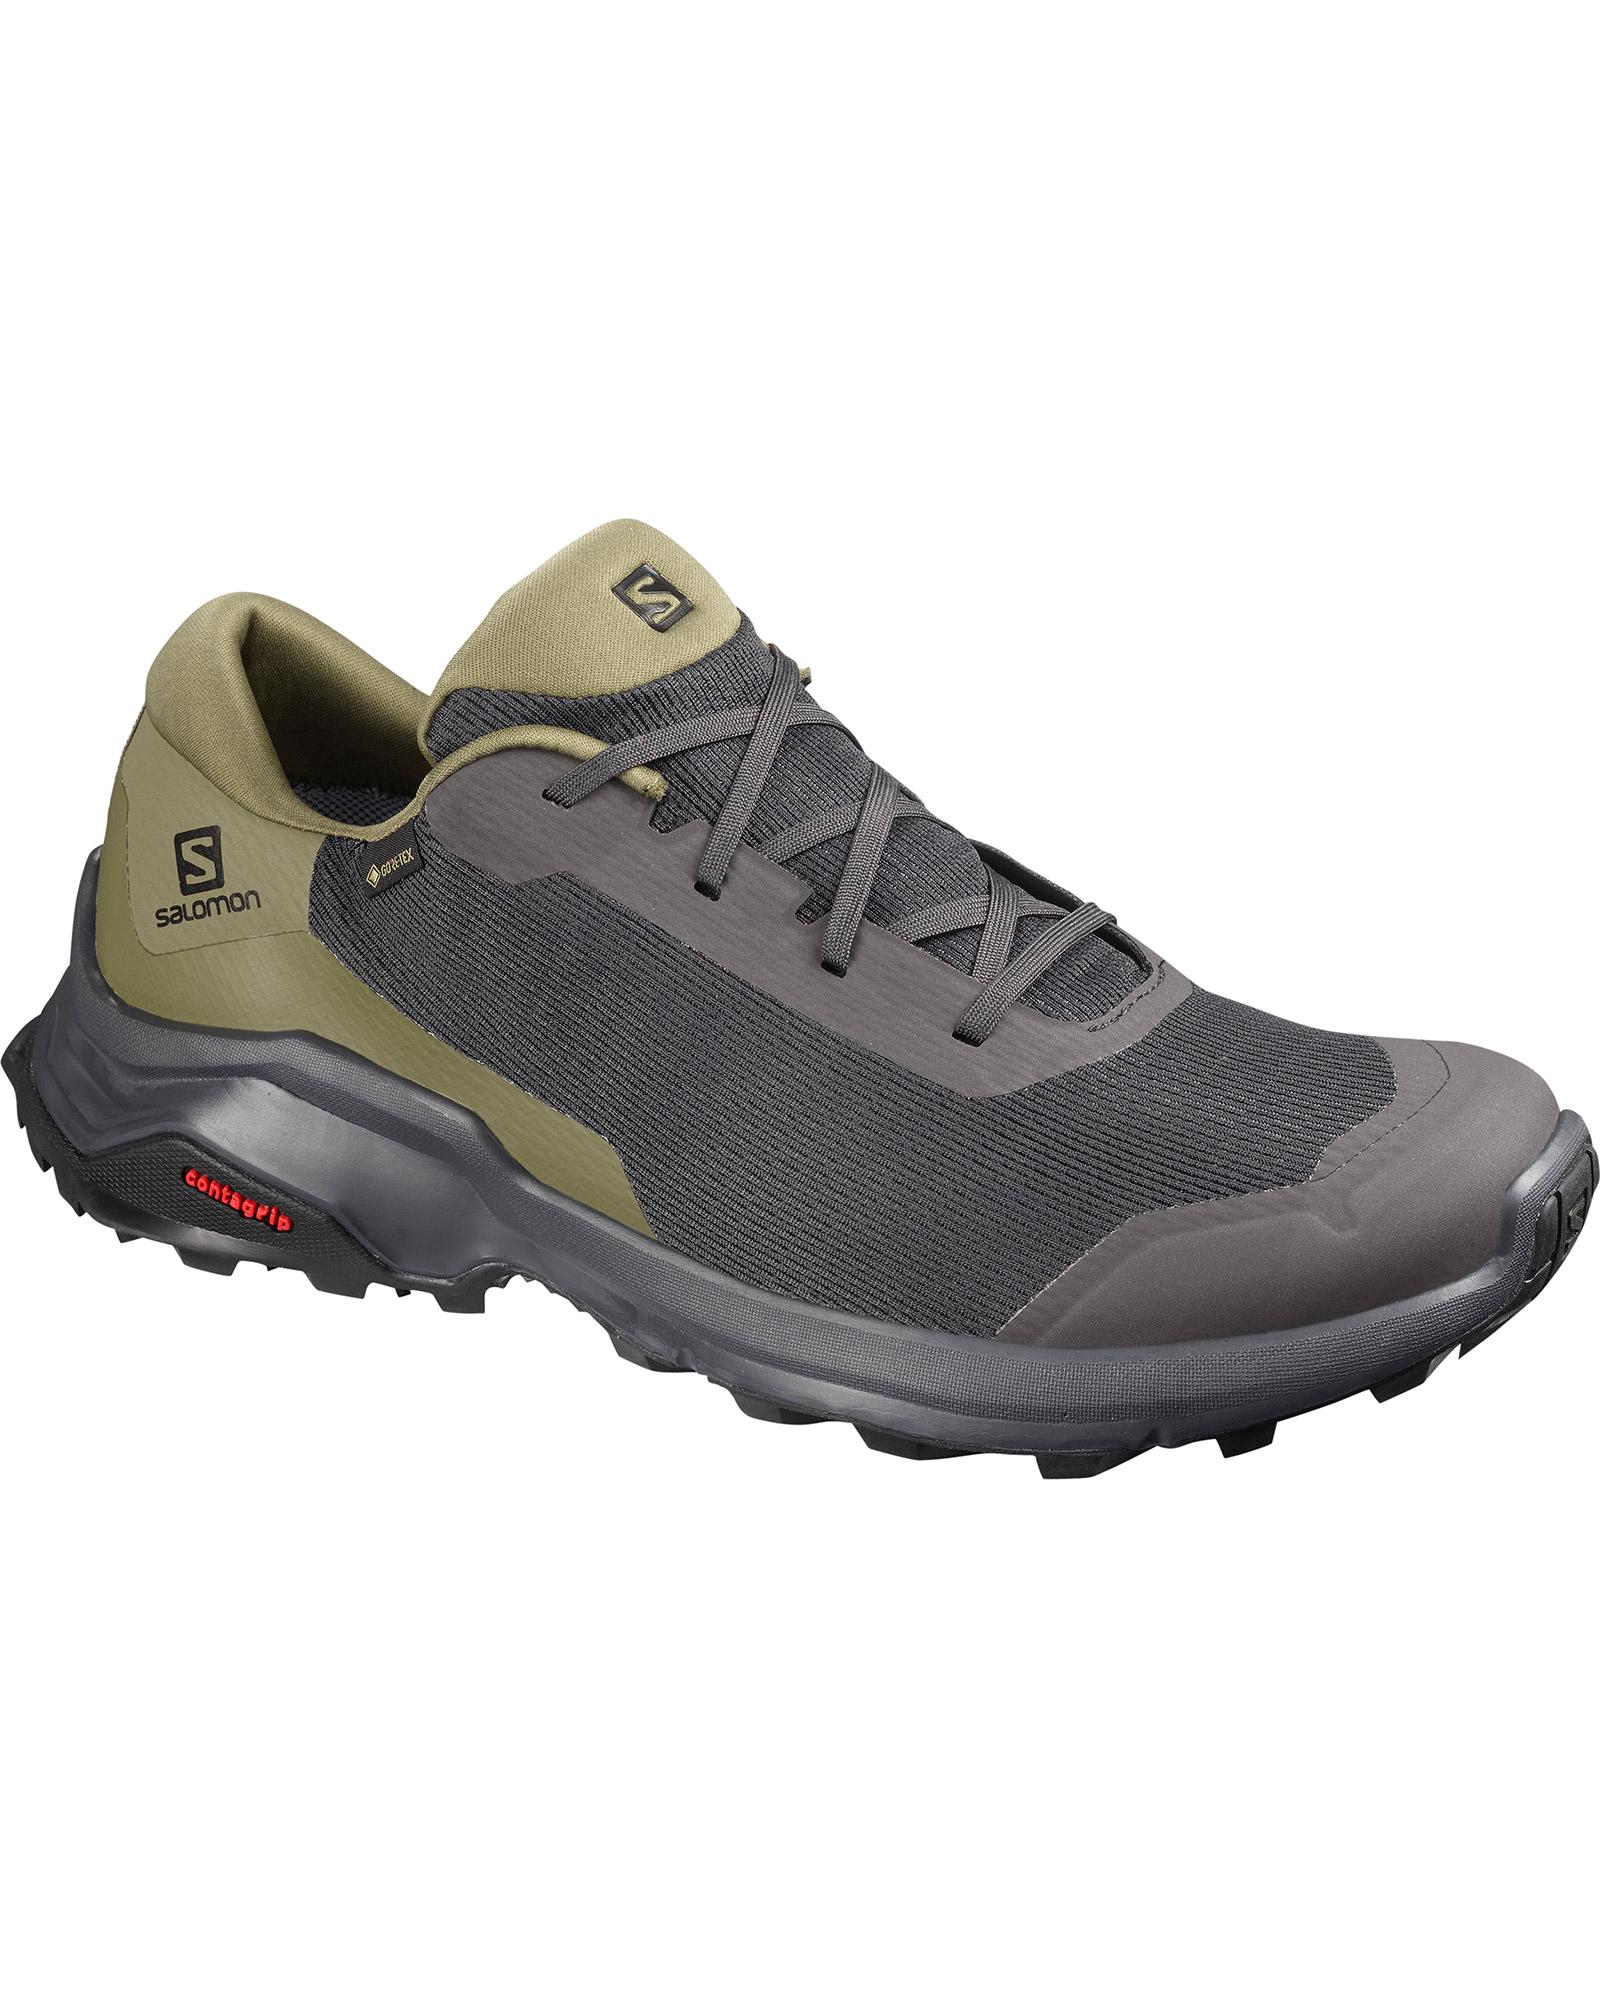 Salomon Men's X Reveal GORE-TEX Walking Shoes 0